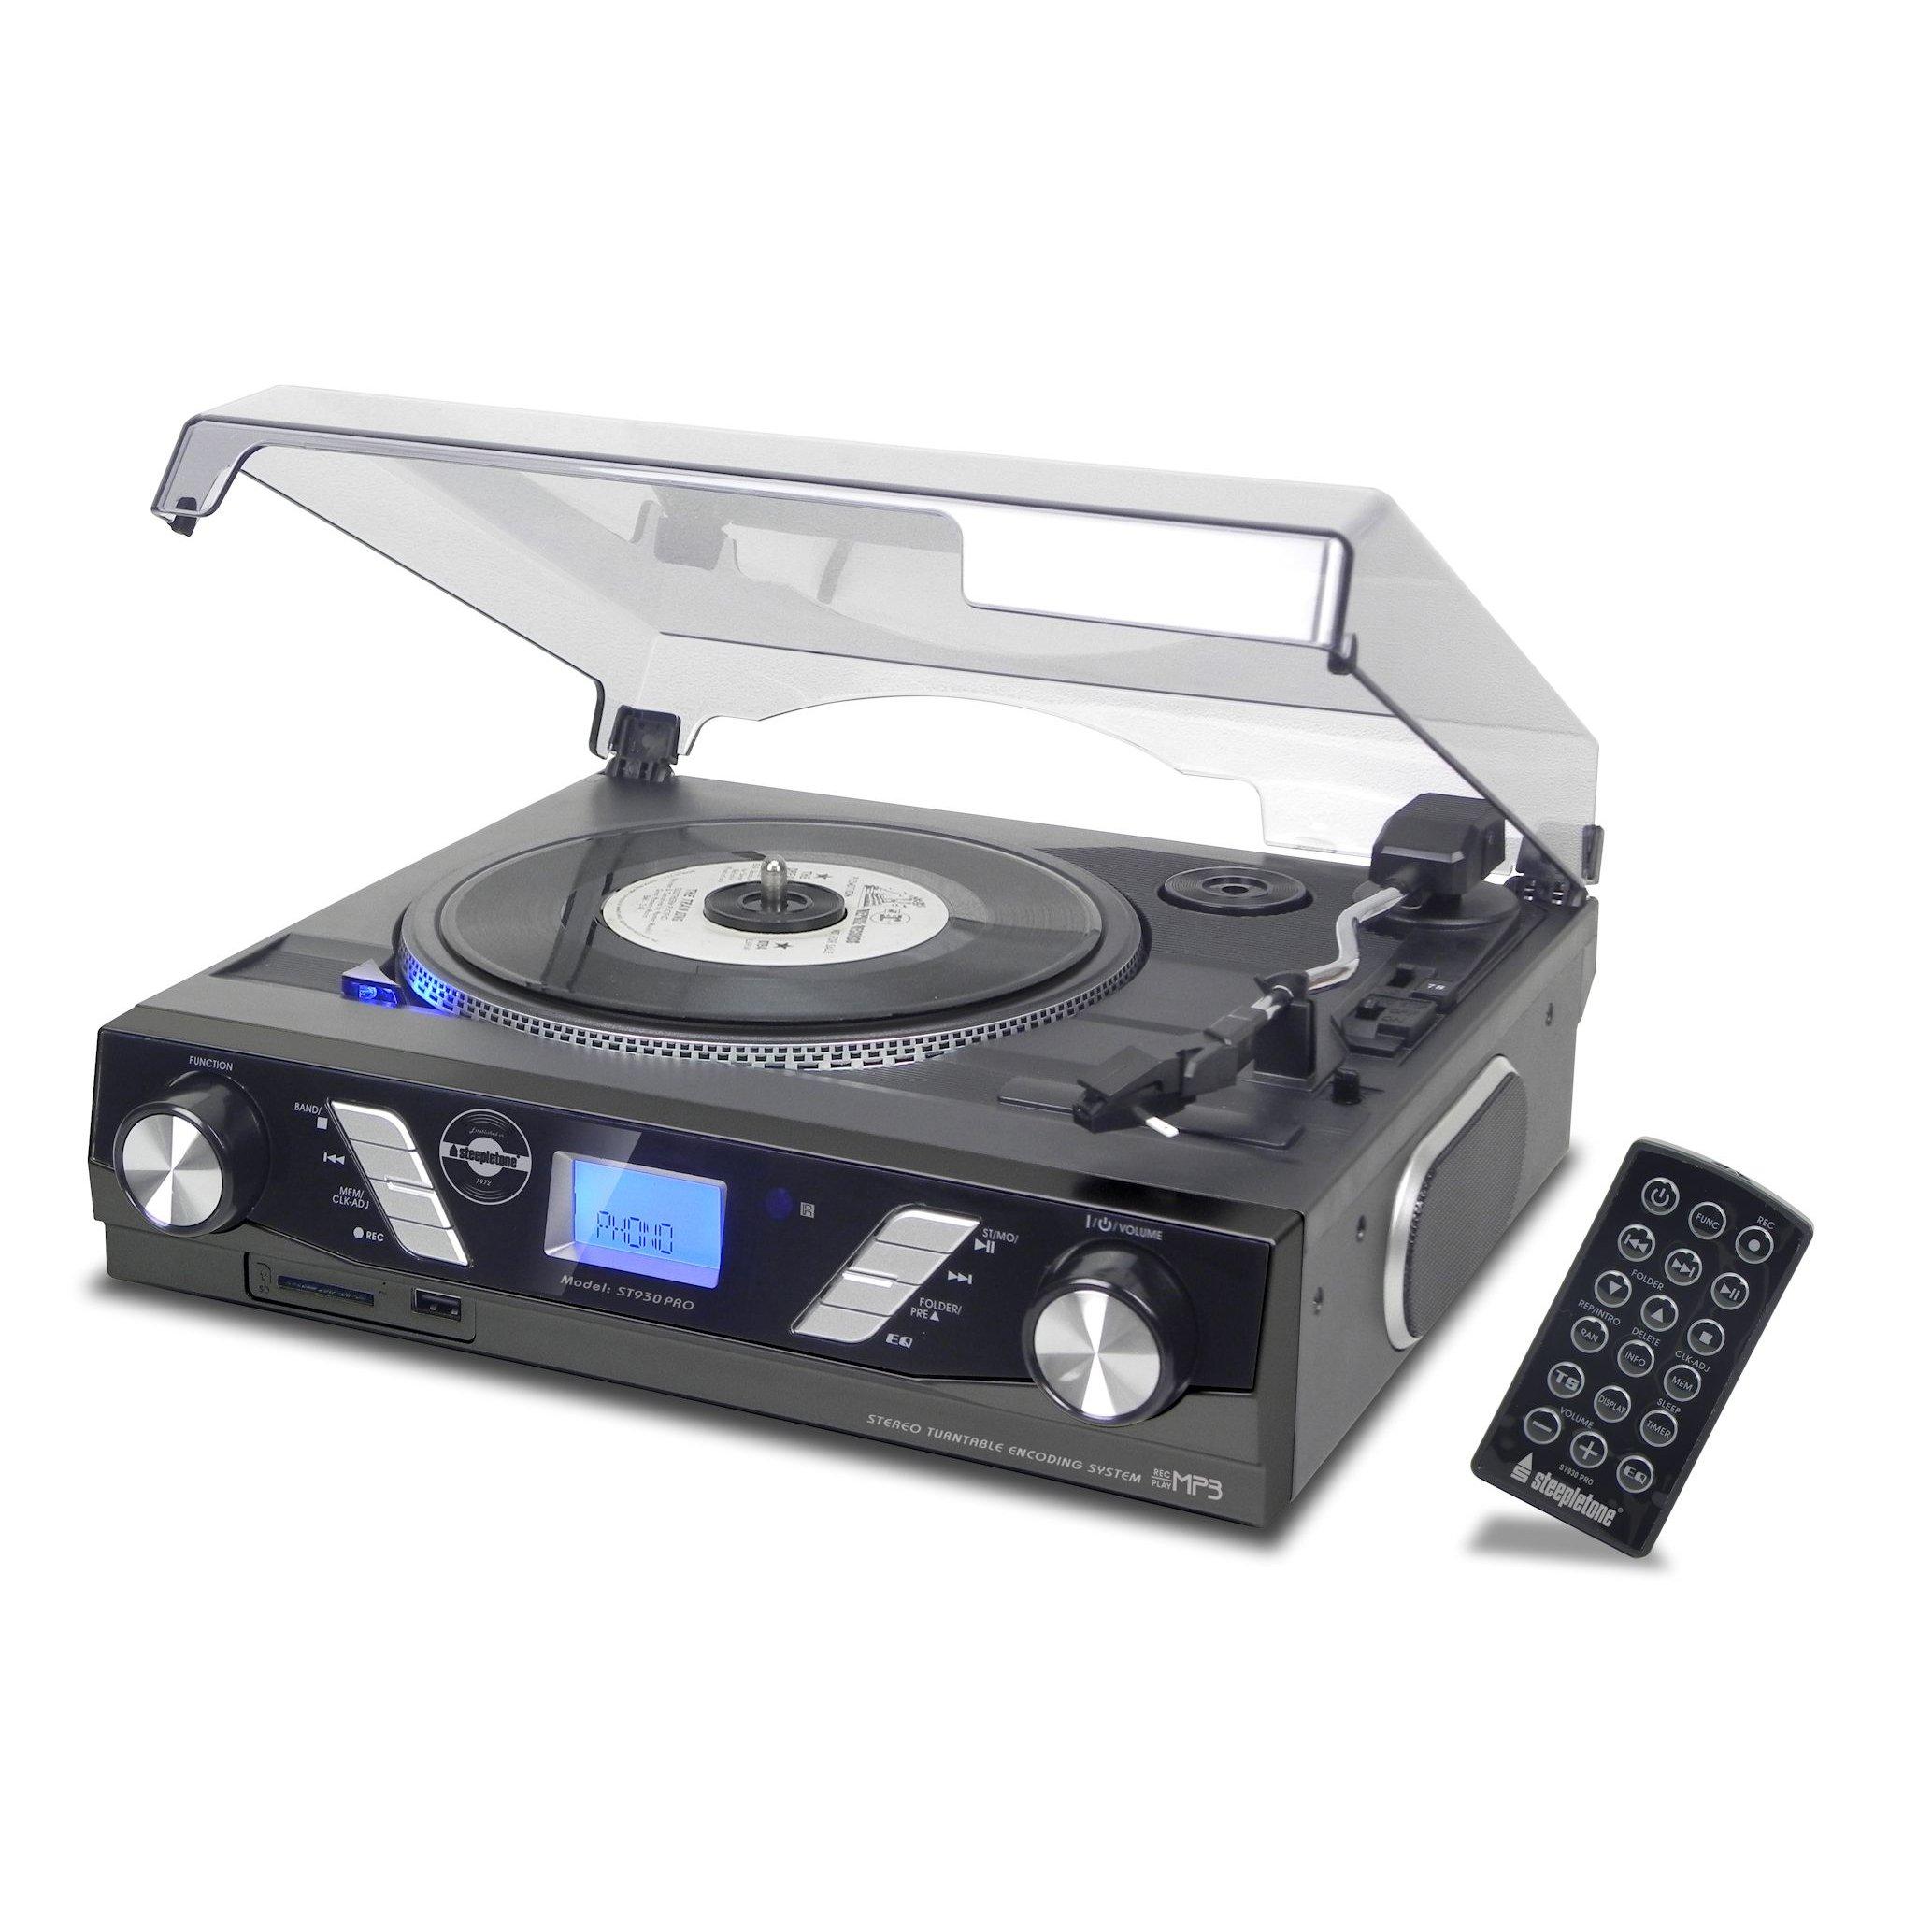 Steepletone ST930 PRO 3 Speed Record Player MP3 to USB SD Recording (Black)